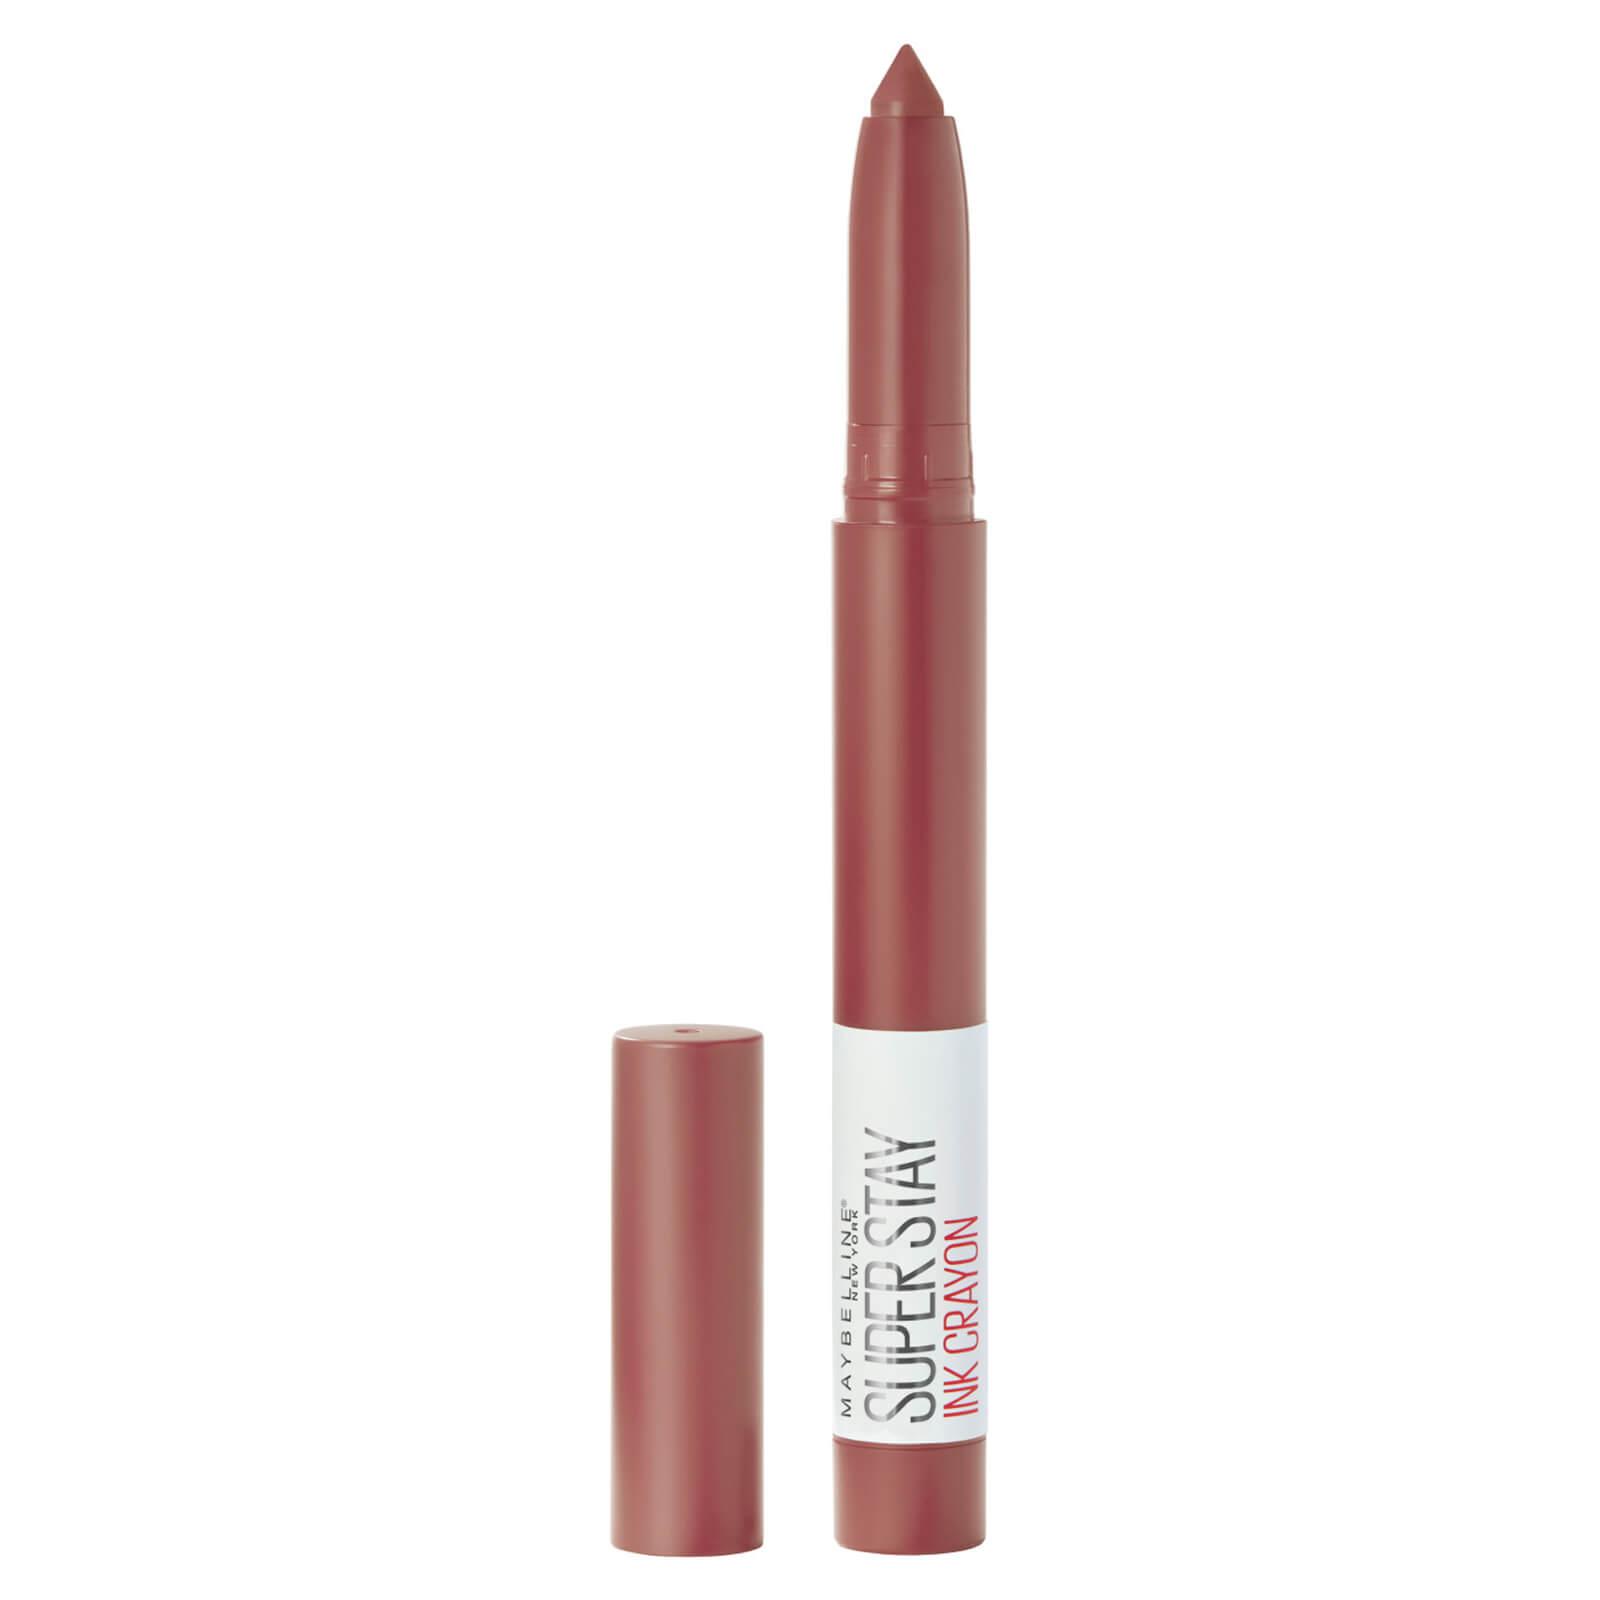 Купить Maybelline Superstay Matte Ink Crayon Lipstick 32g (Various Shades) - 20 Enjoy the View